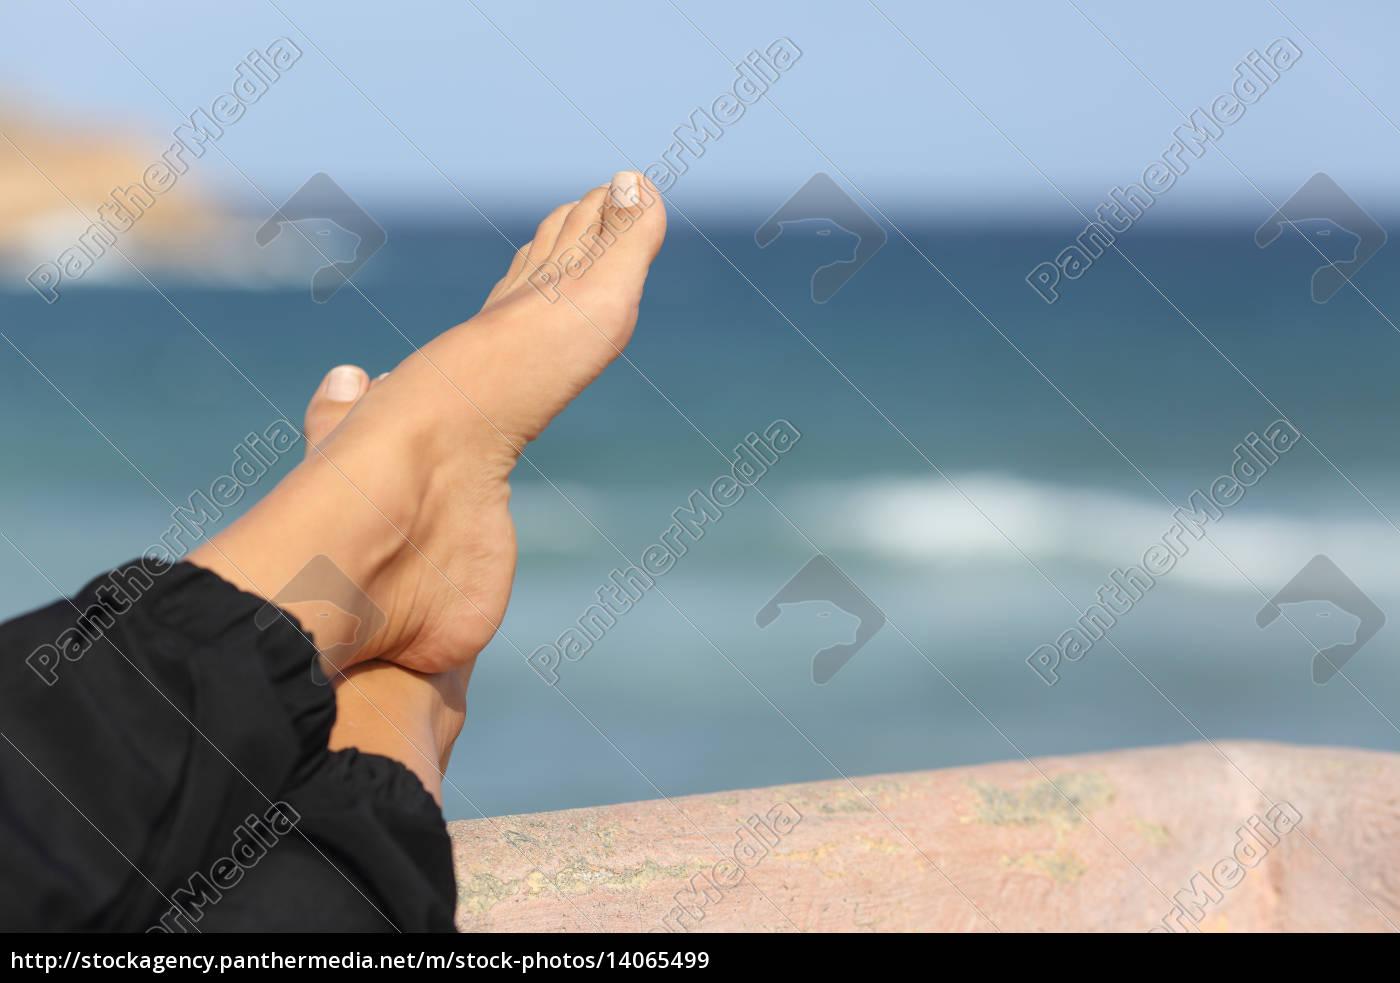 woman, feet, relaxing, on, an, hotel - 14065499